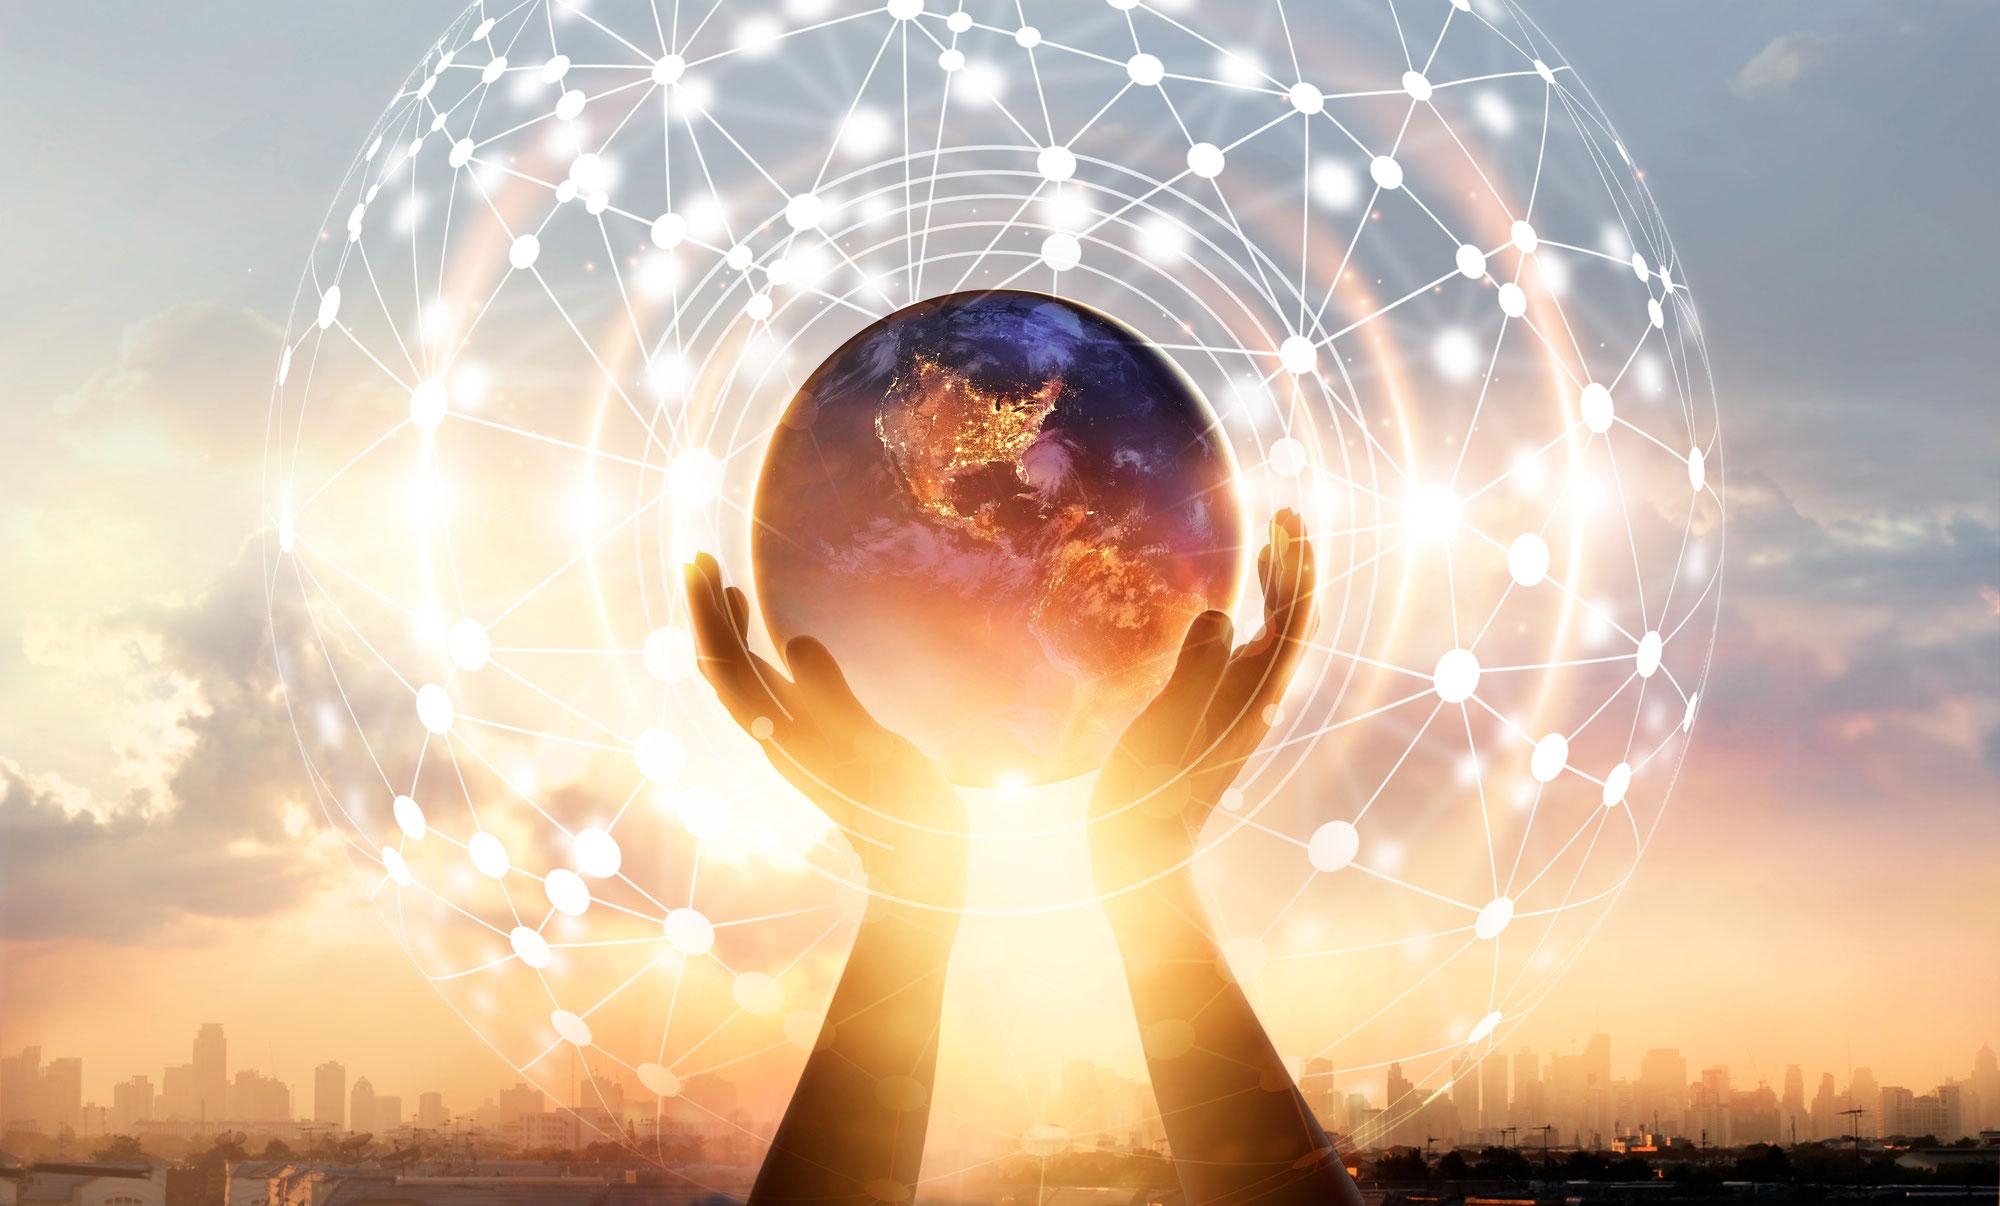 The seeds of Christ Consciousness ♥ Pamela Kribbe ♥ Lightraisers